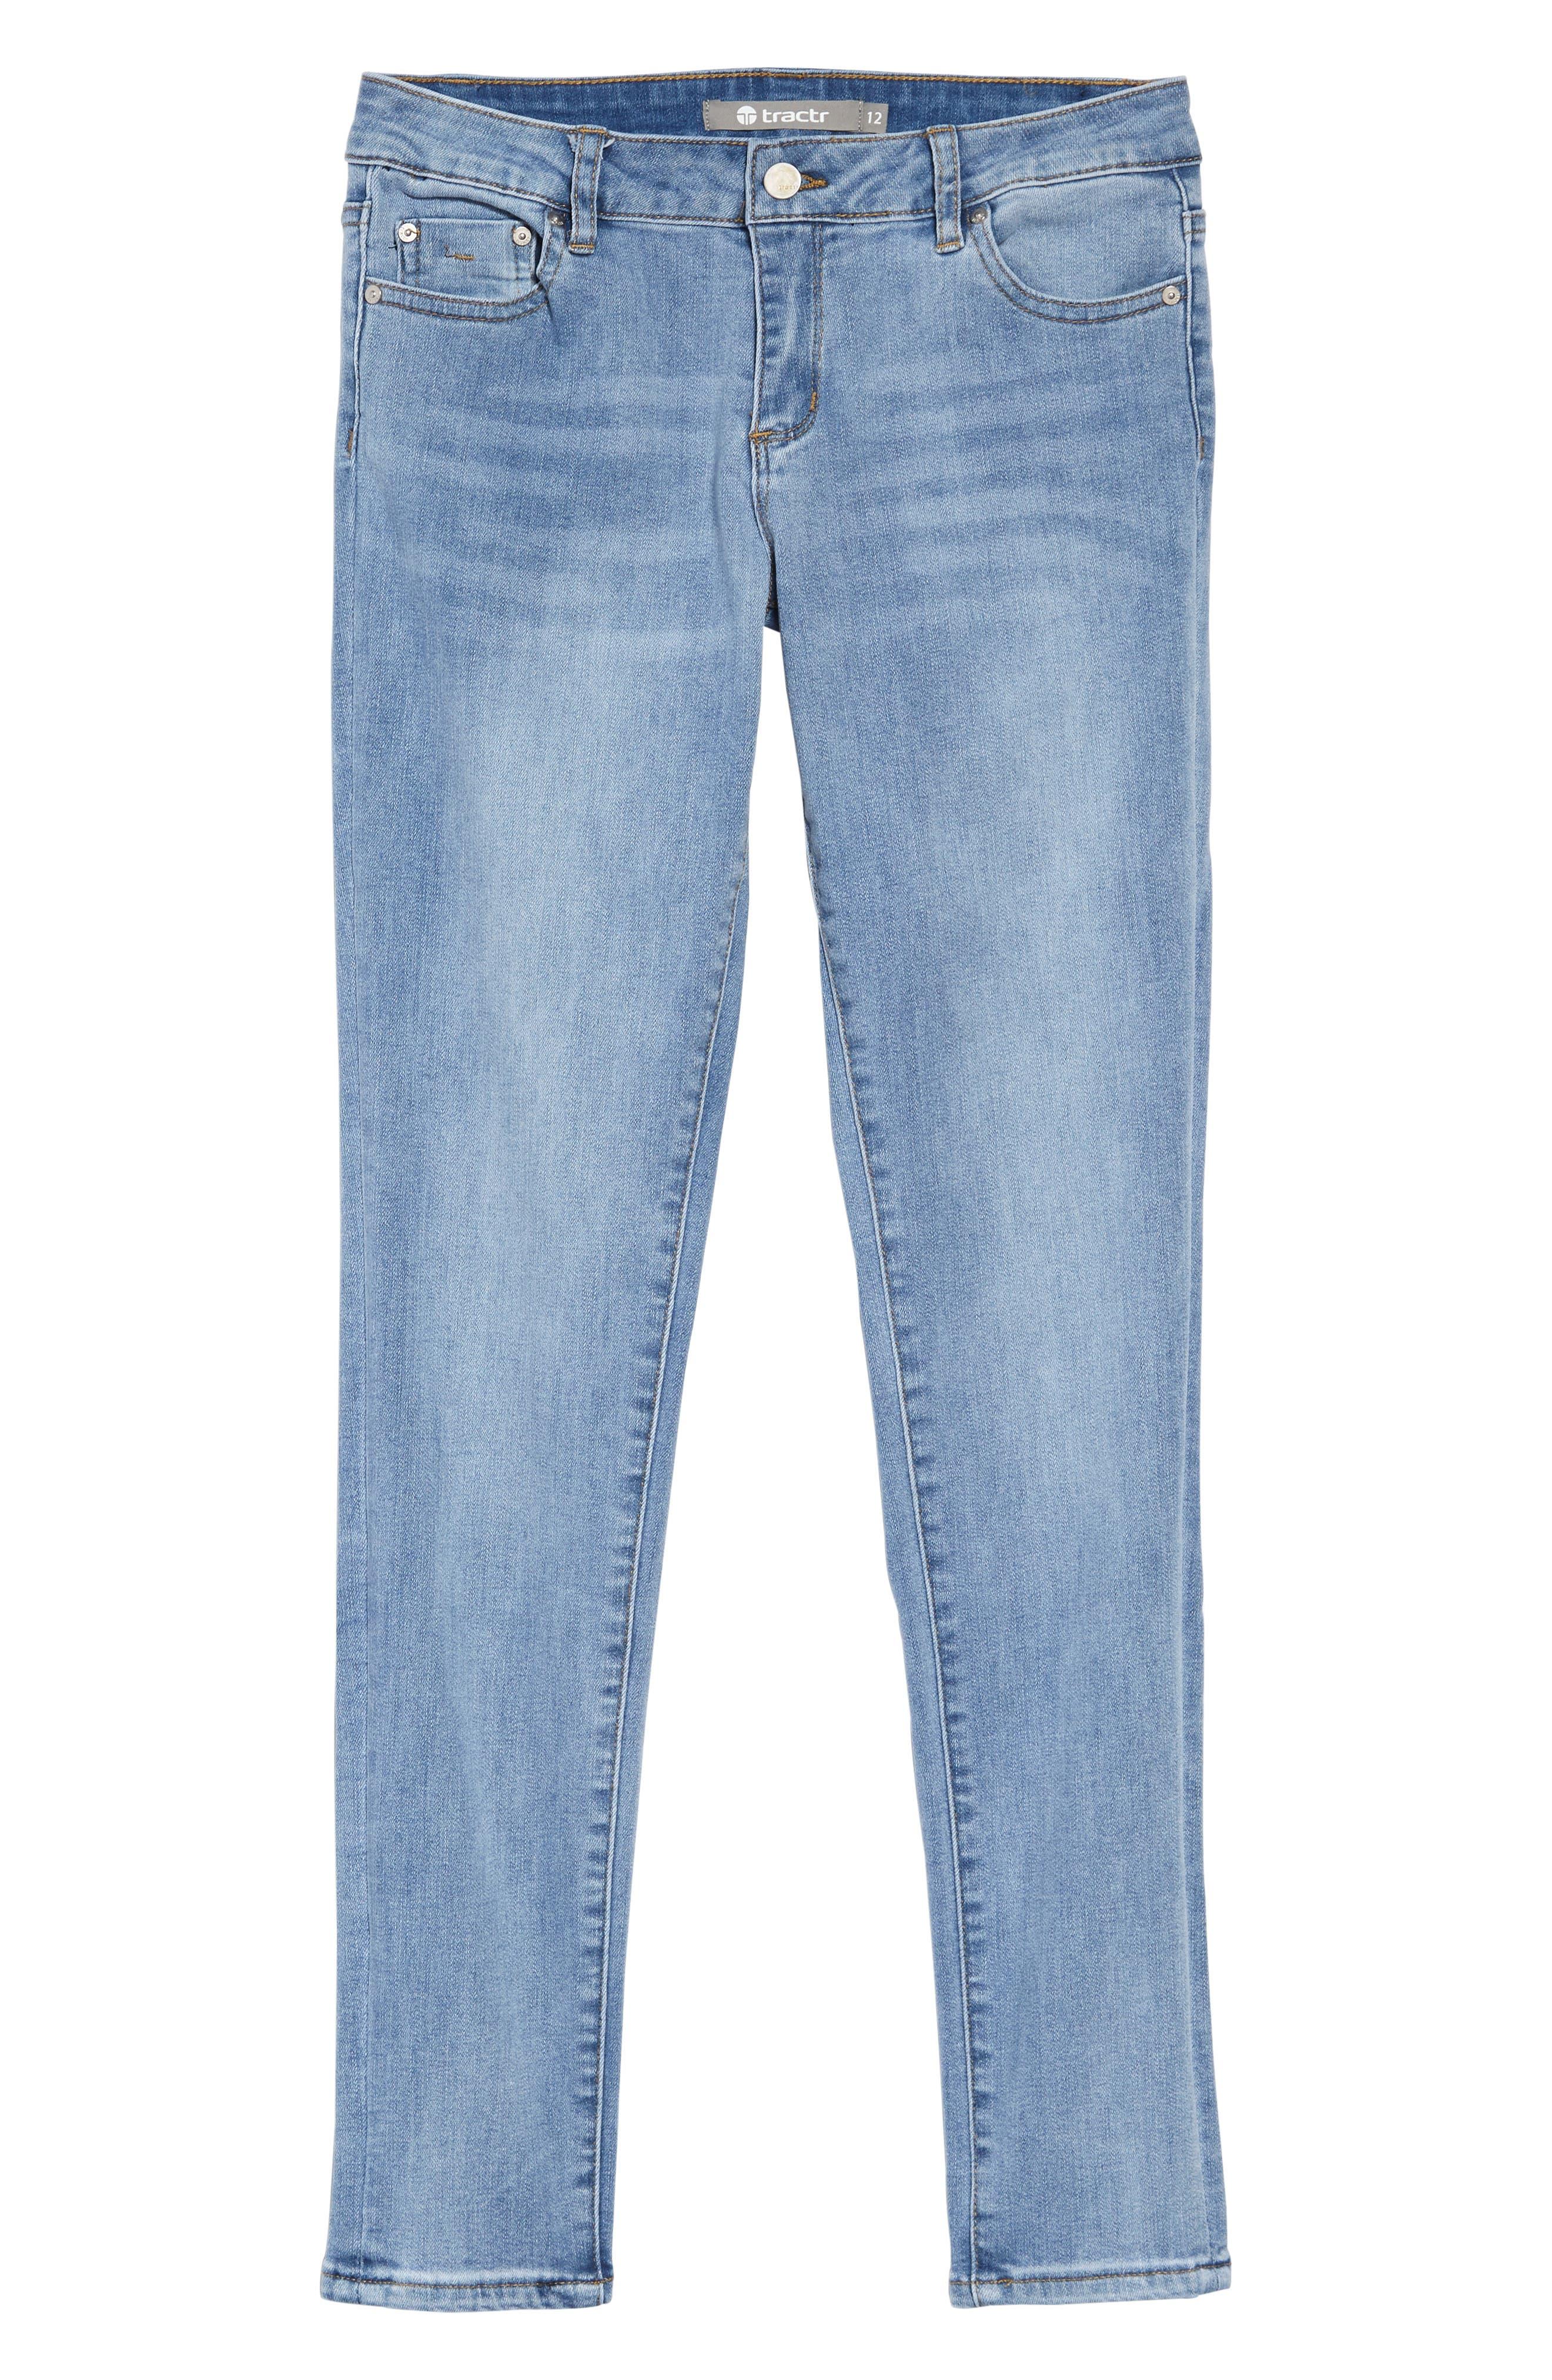 TRACTR Diane Skinny Jeans, Main, color, LIGHT INDIGO